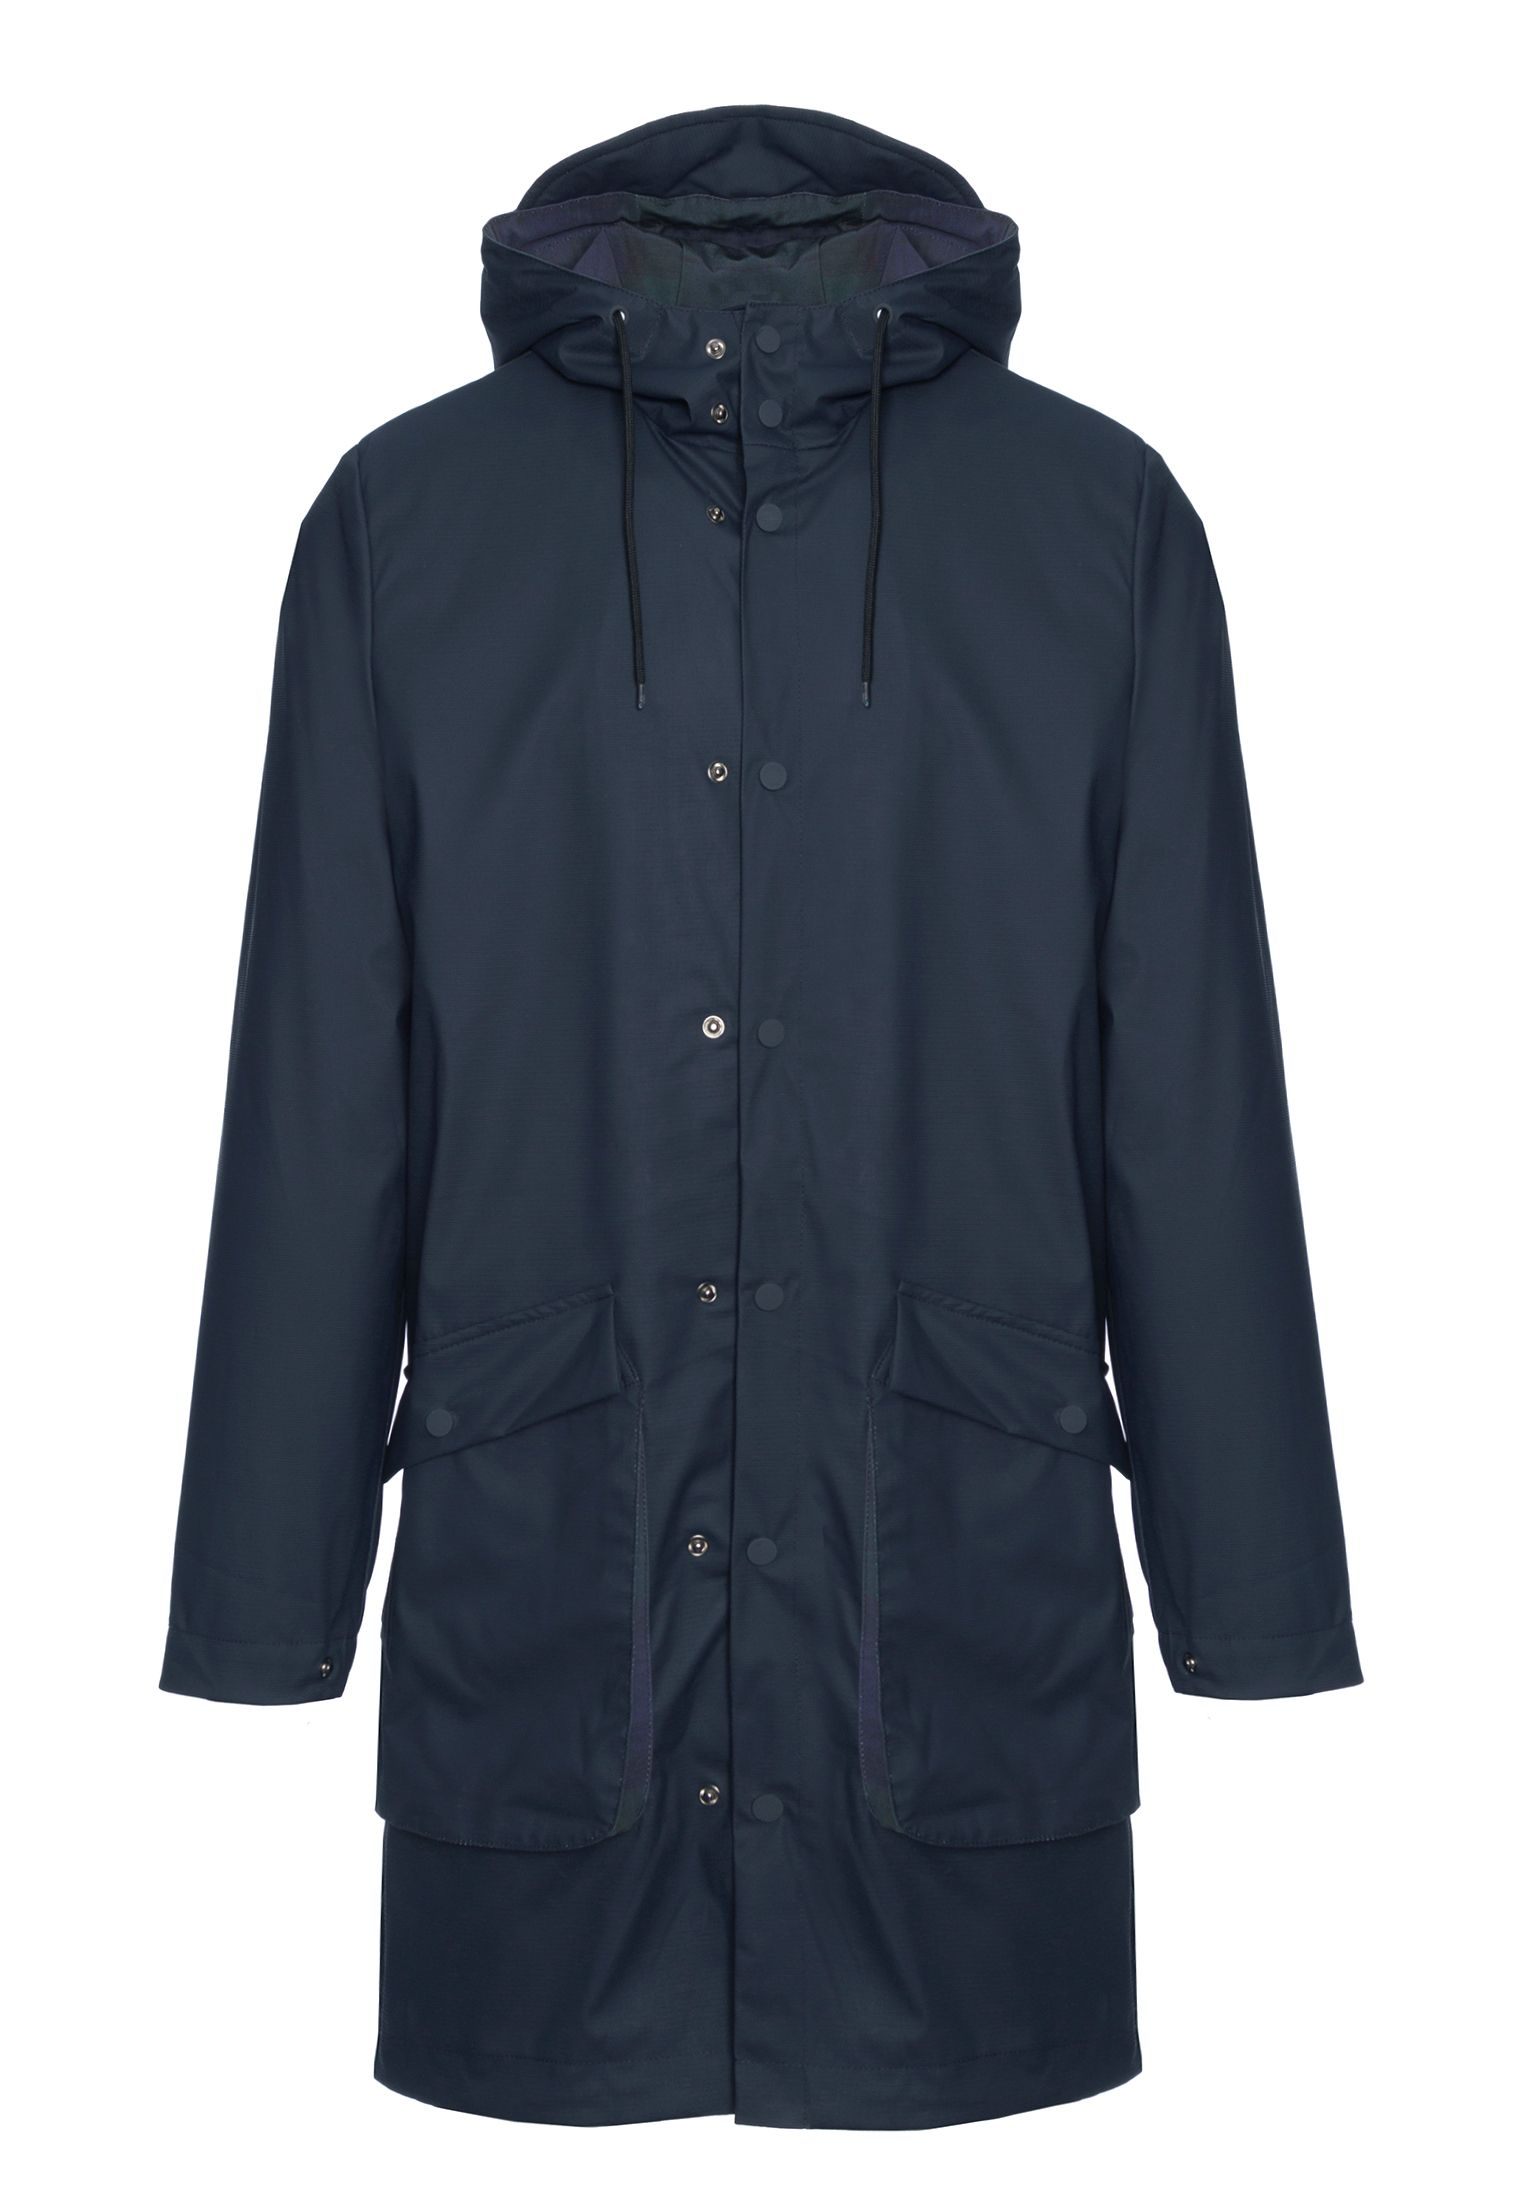 Fitzroy Men's Fishtail Raincoat parka in Dark Navy